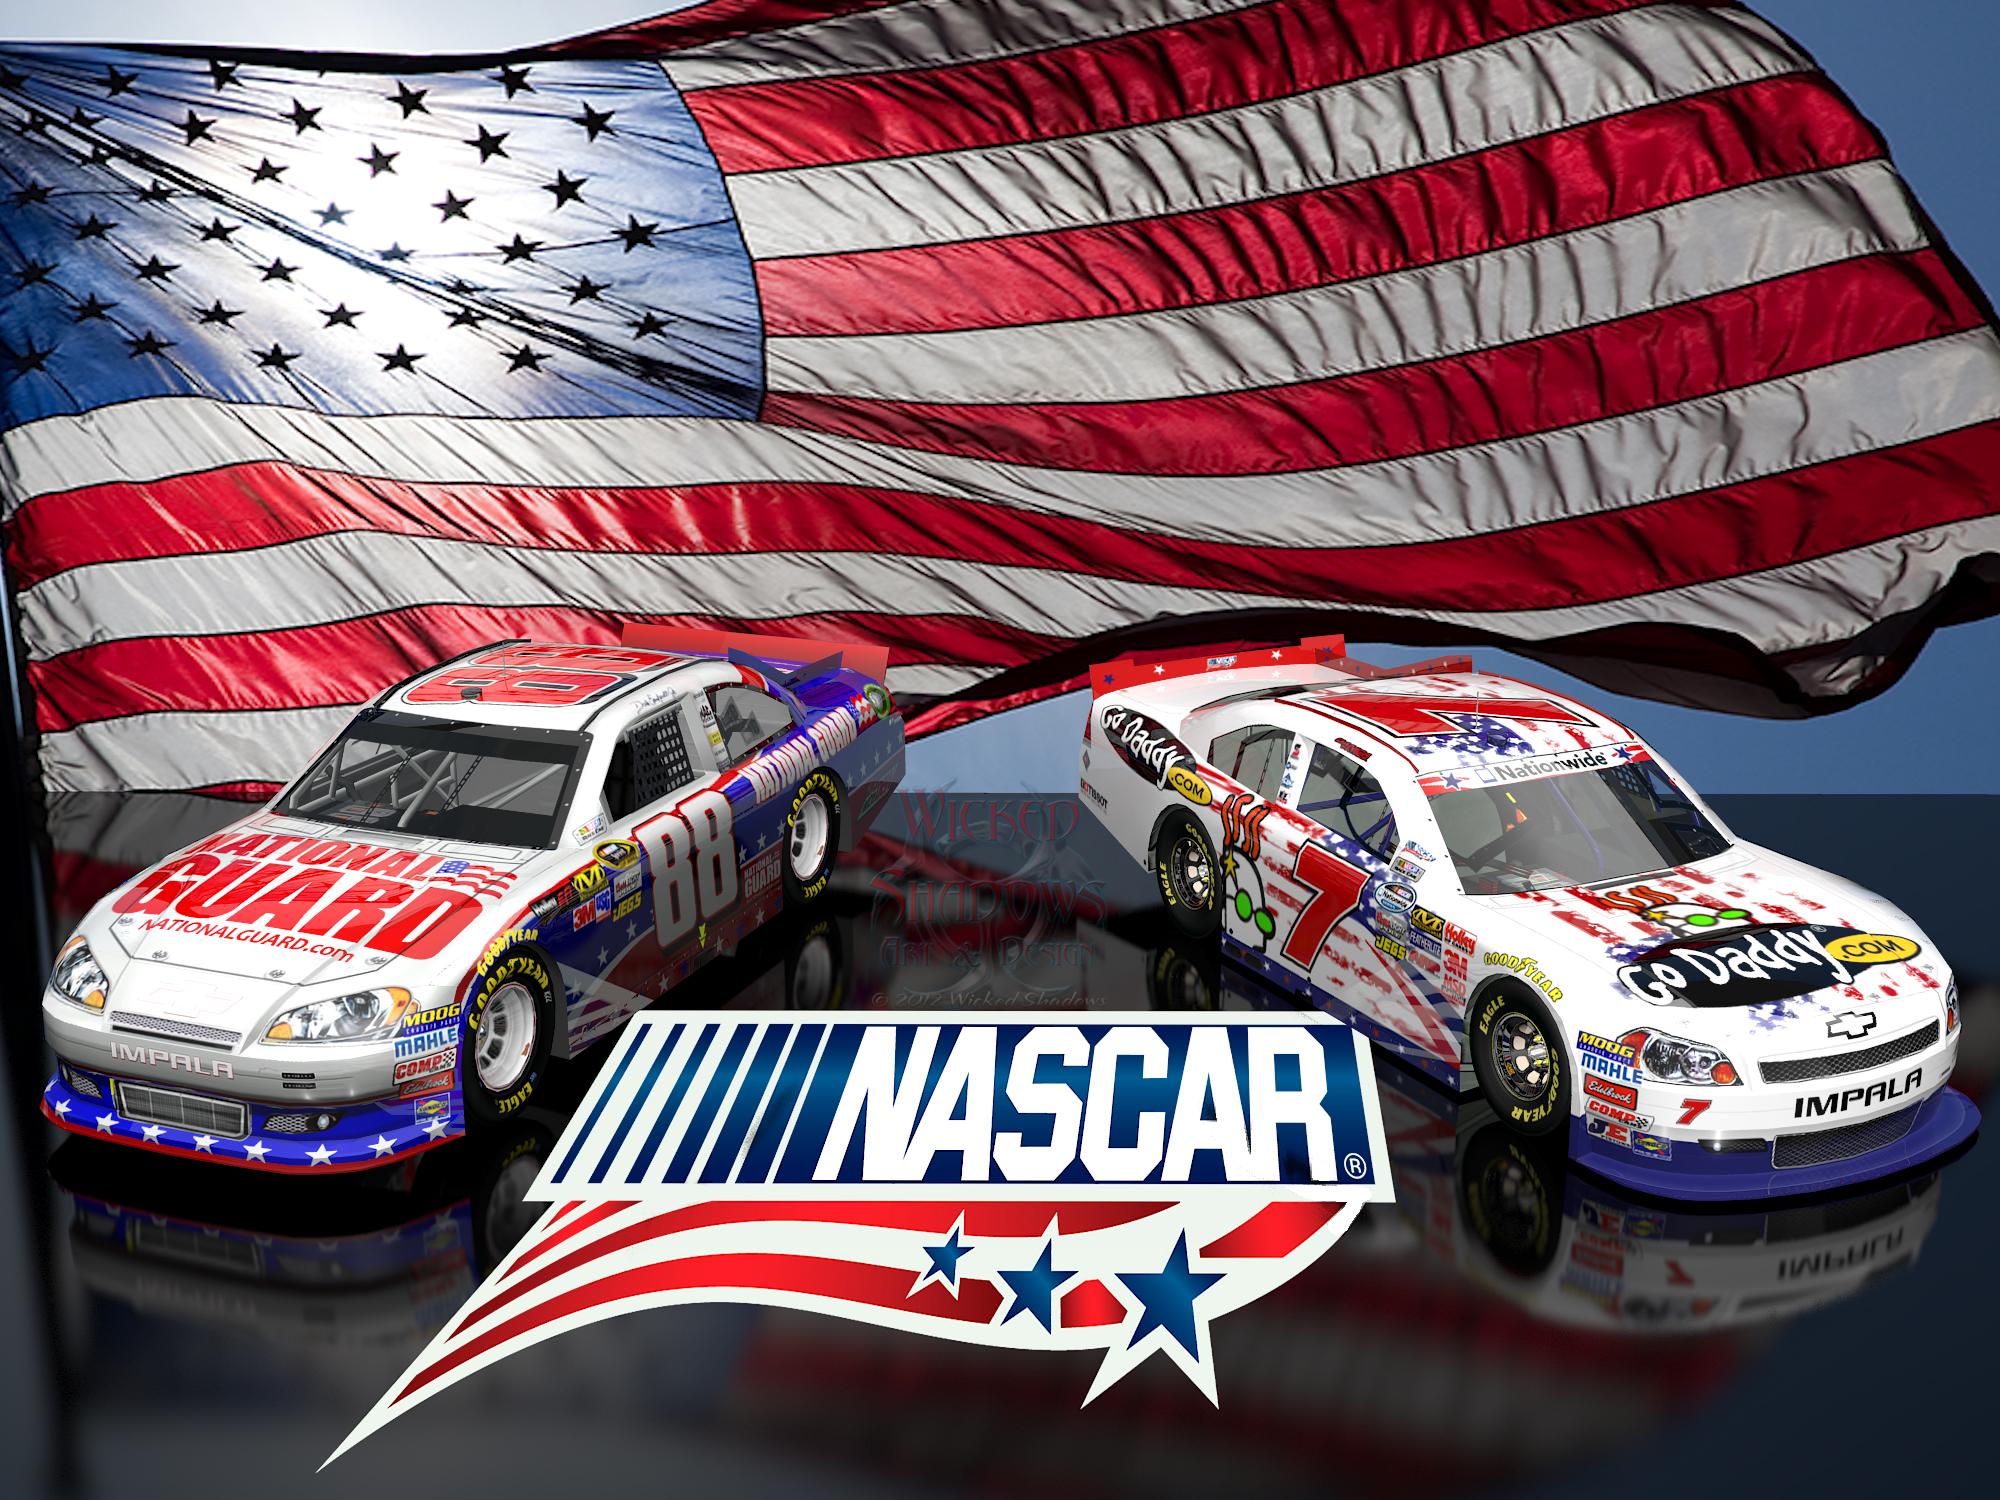 Danica Patrick Dale Earnhardt Jr NASCAR Unites wallpaper 4x3